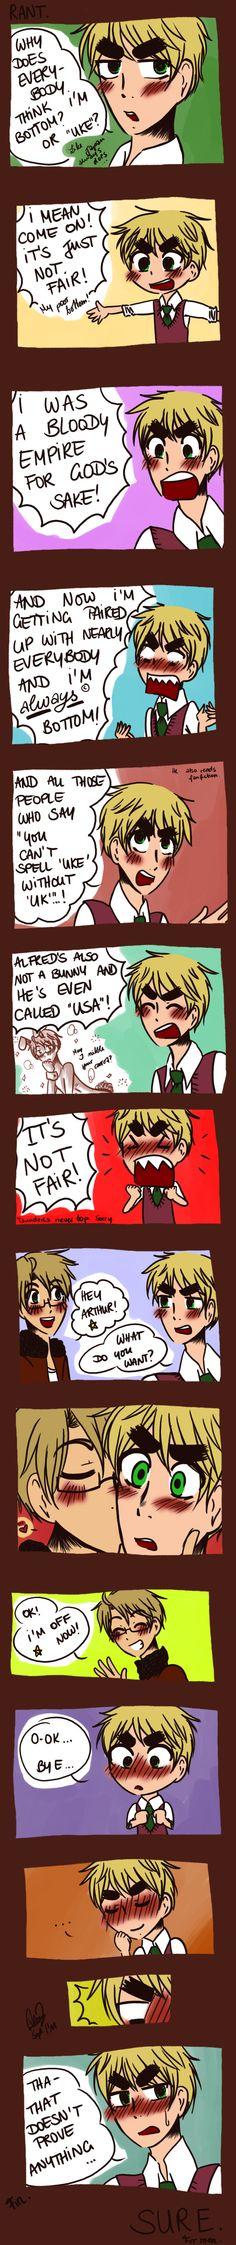 ARTHUR'S RANT. by ~TheGweny - Hehehe  I don't like USUK (It'd be better if it were FrUK) but it's still a cute comic